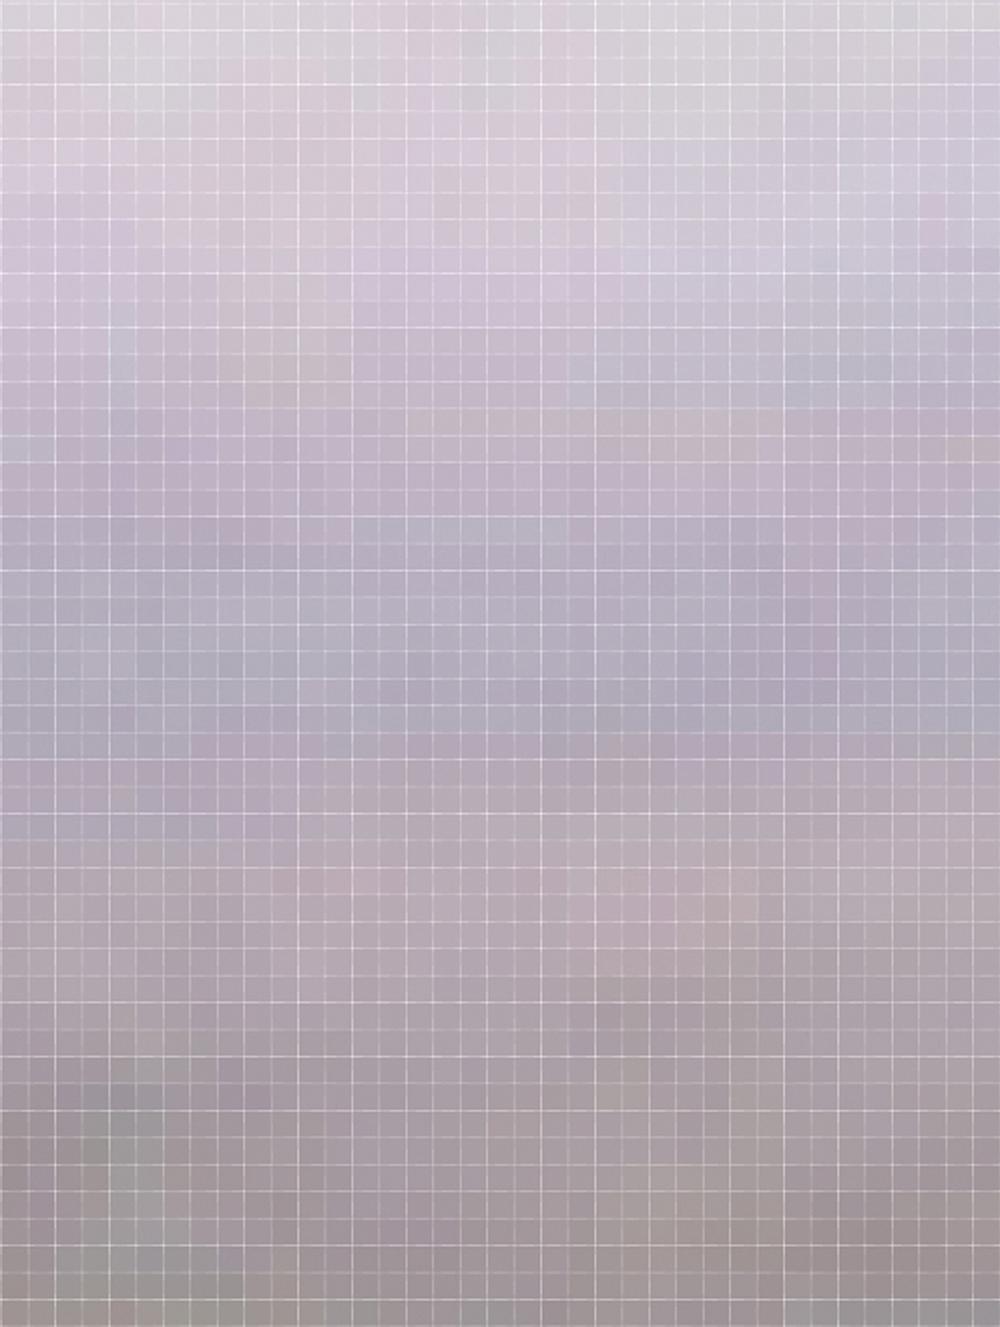 pixel4.jpg